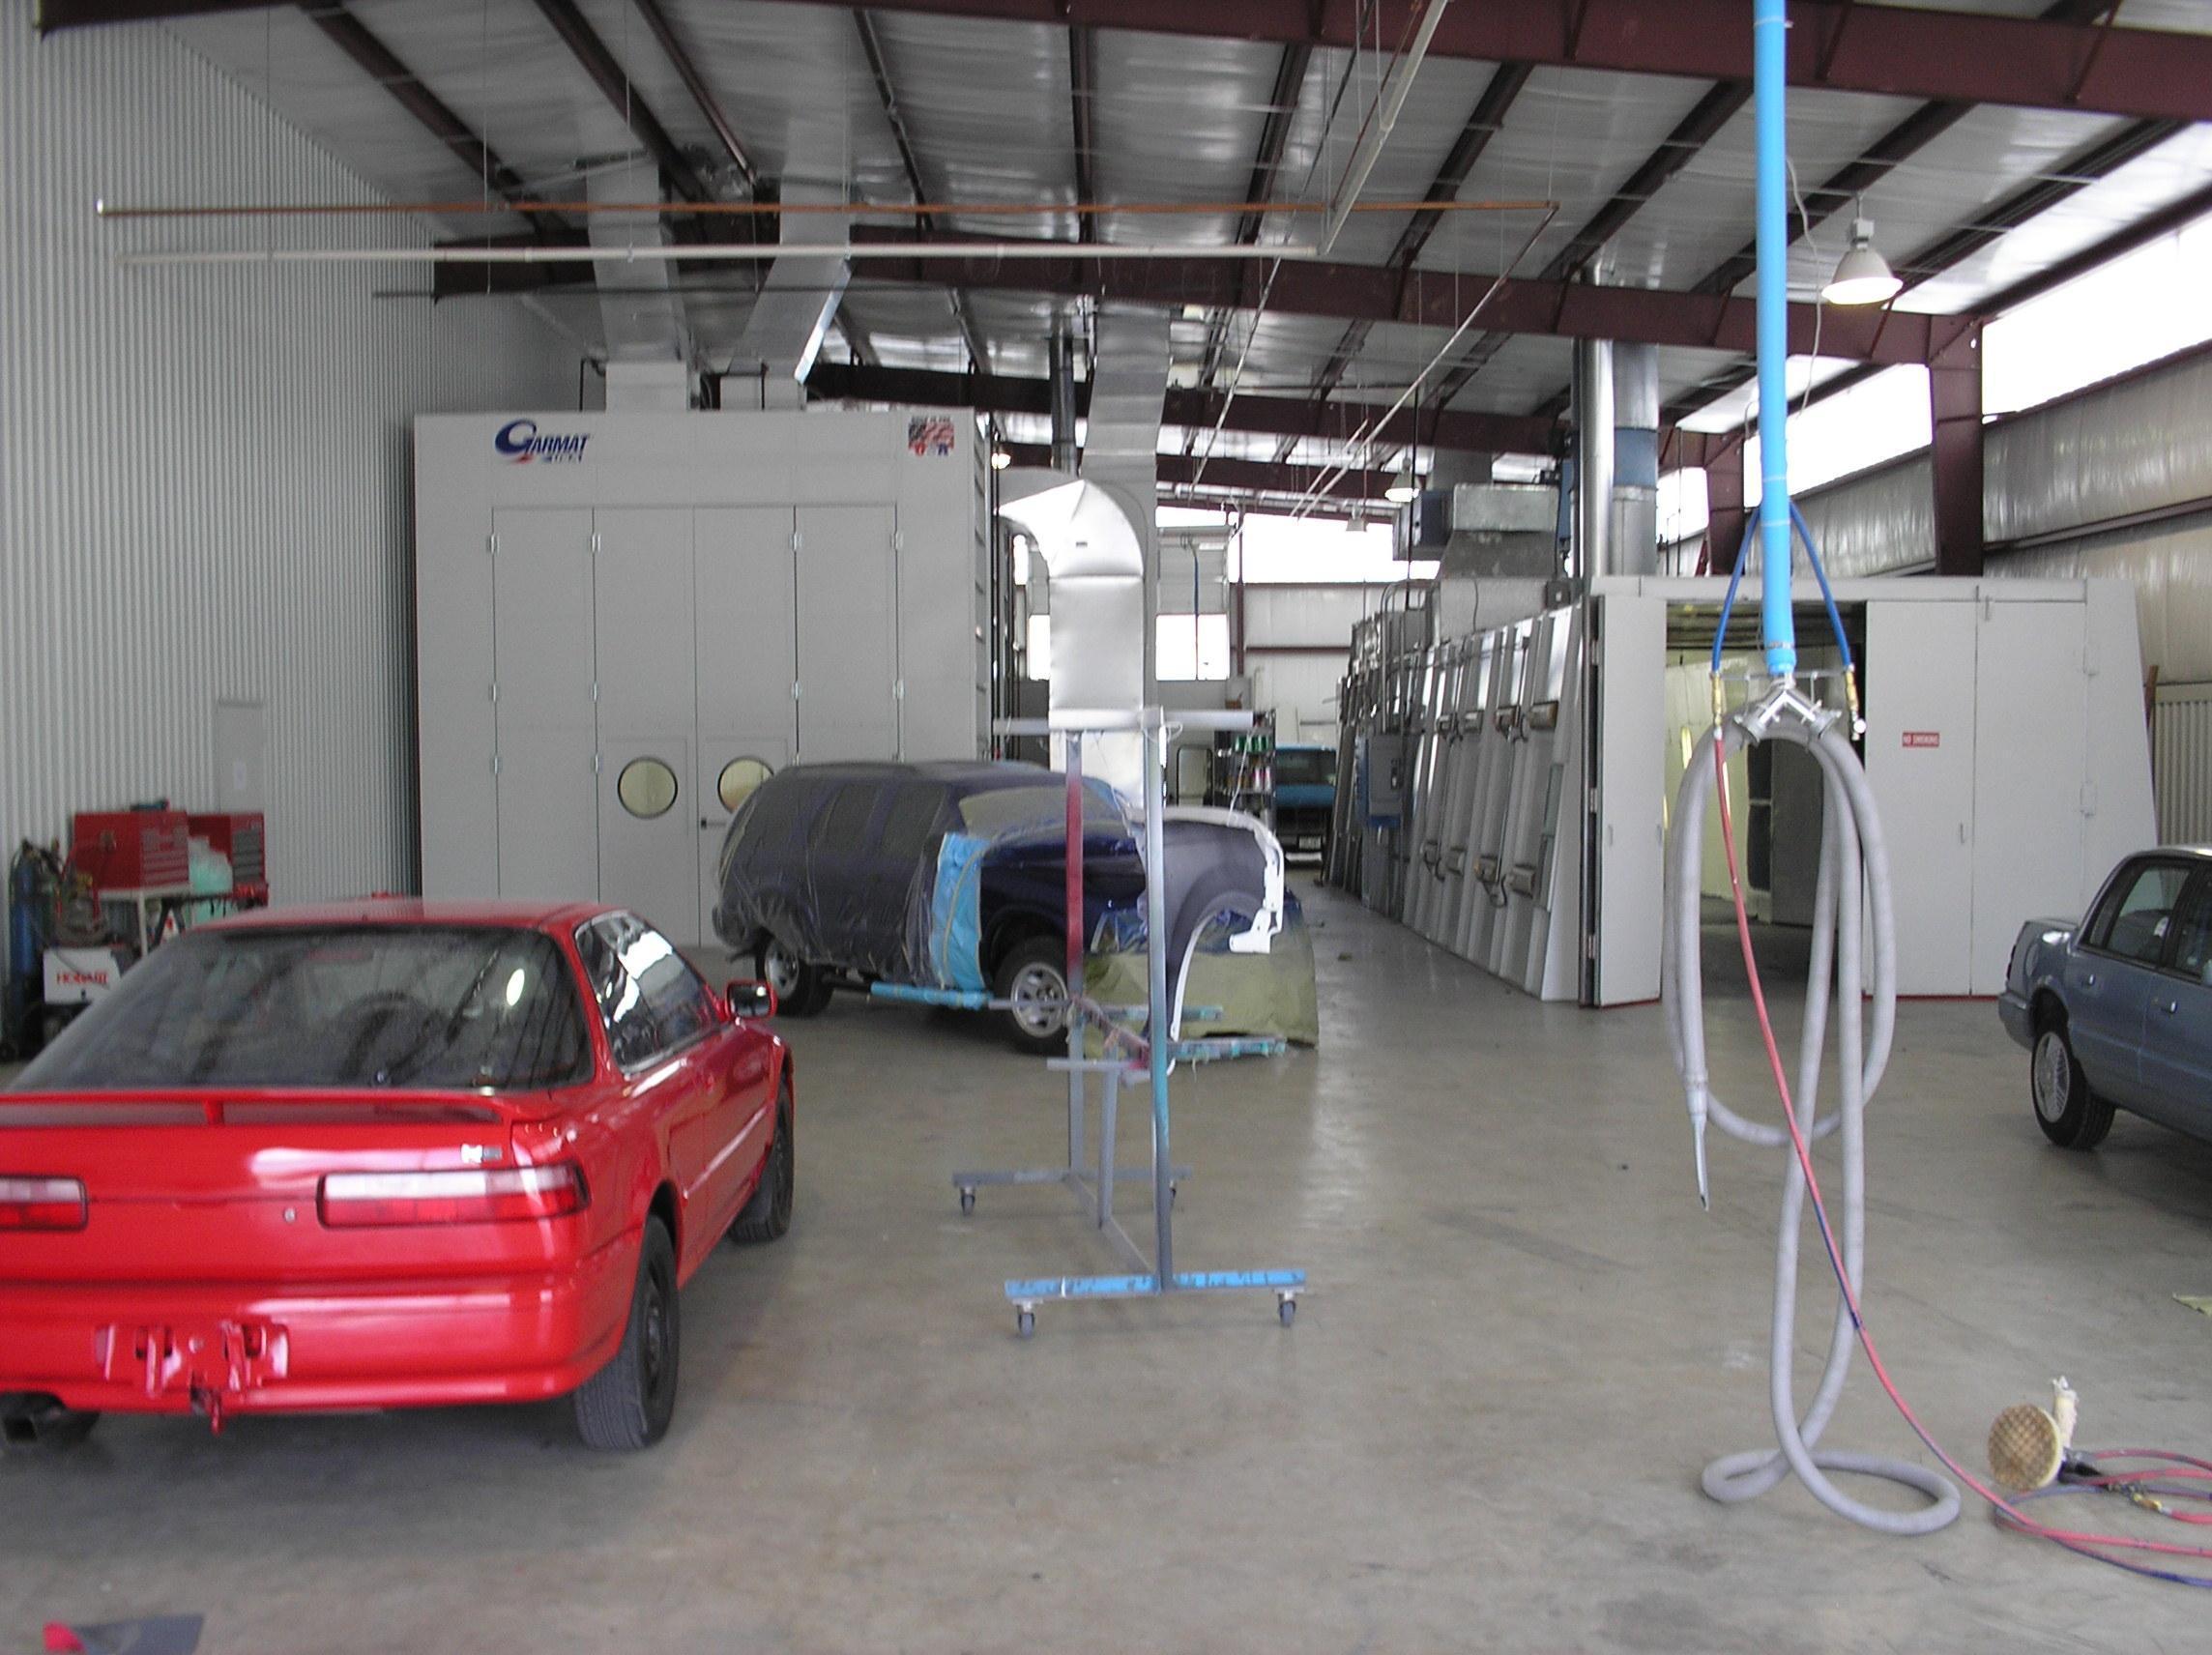 Maaco Collision Repair & Auto Painting In Houston, TX